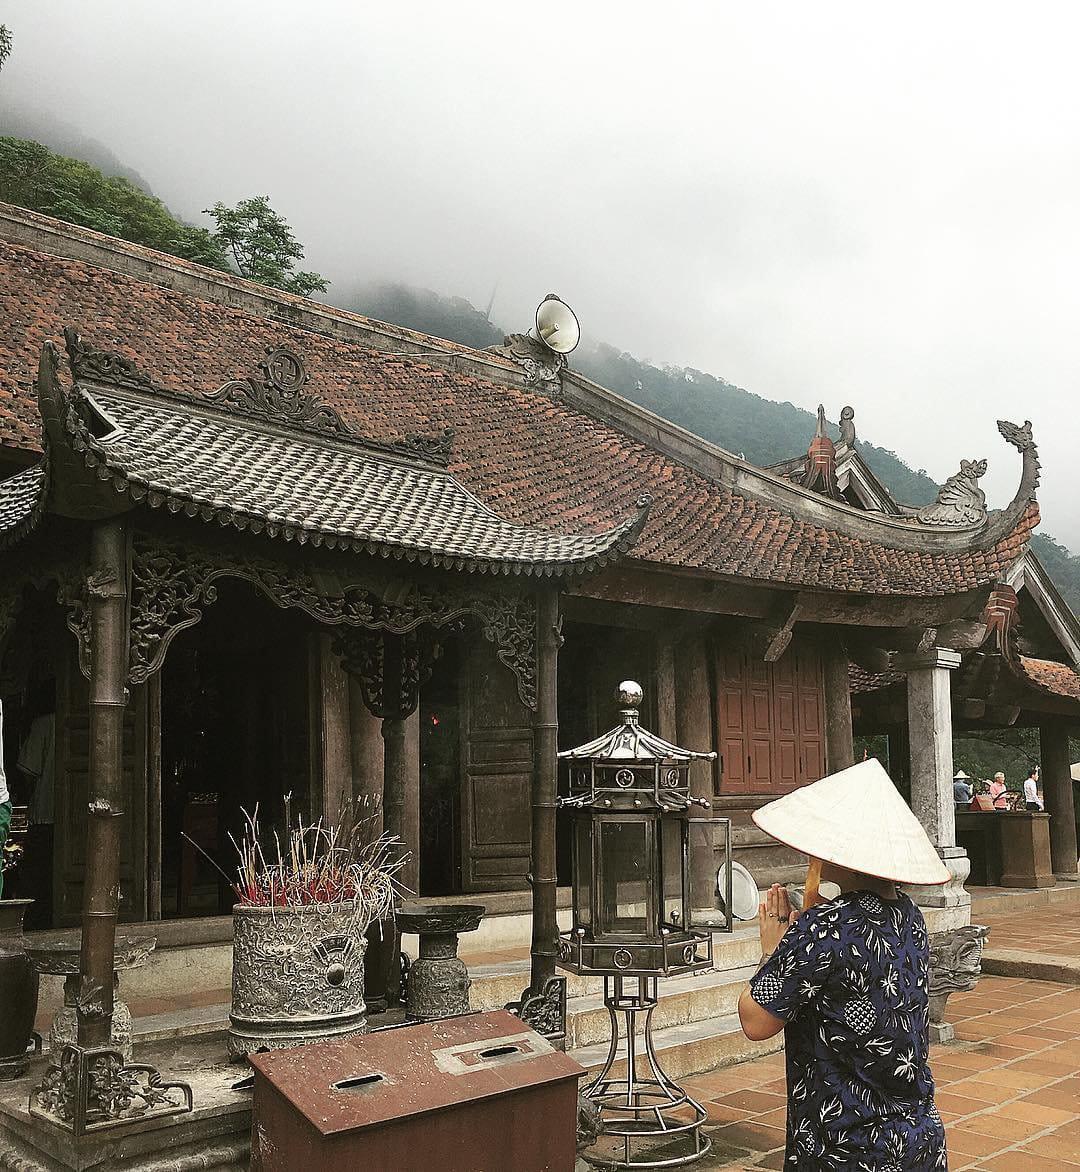 kinh-nghiem-trekking-nui-yen-tu-nhe-nhu-khong-tu-a-z-cho-hoi-banh-beo-29